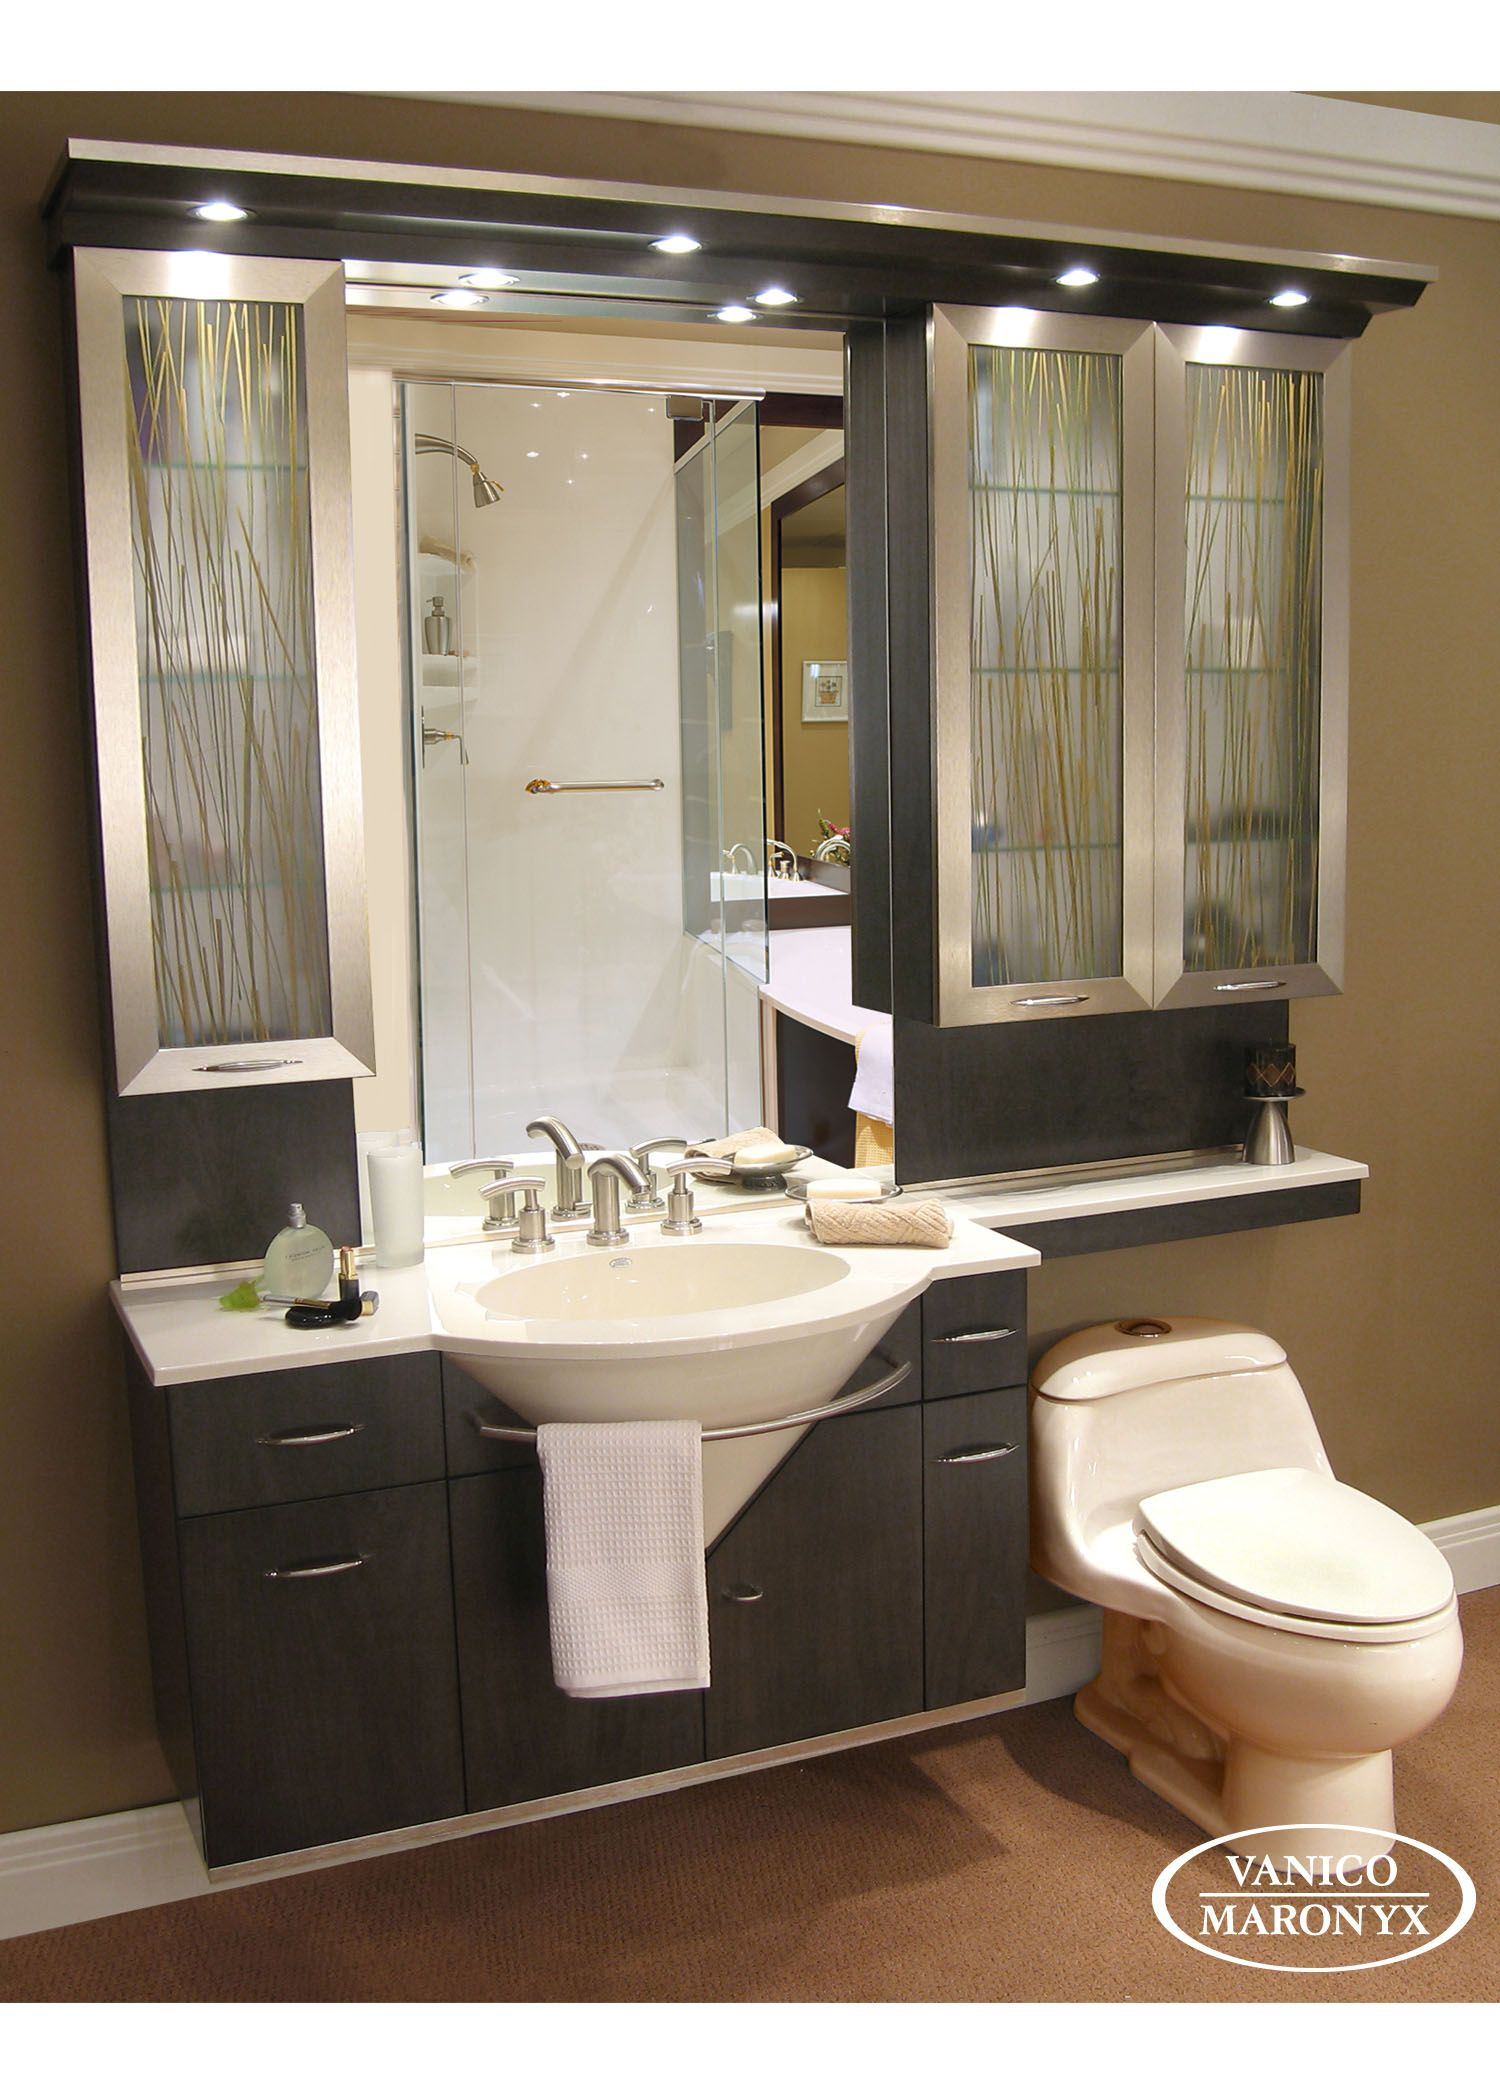 Modern black bath vanity by Vanico Maronyx / Avanti